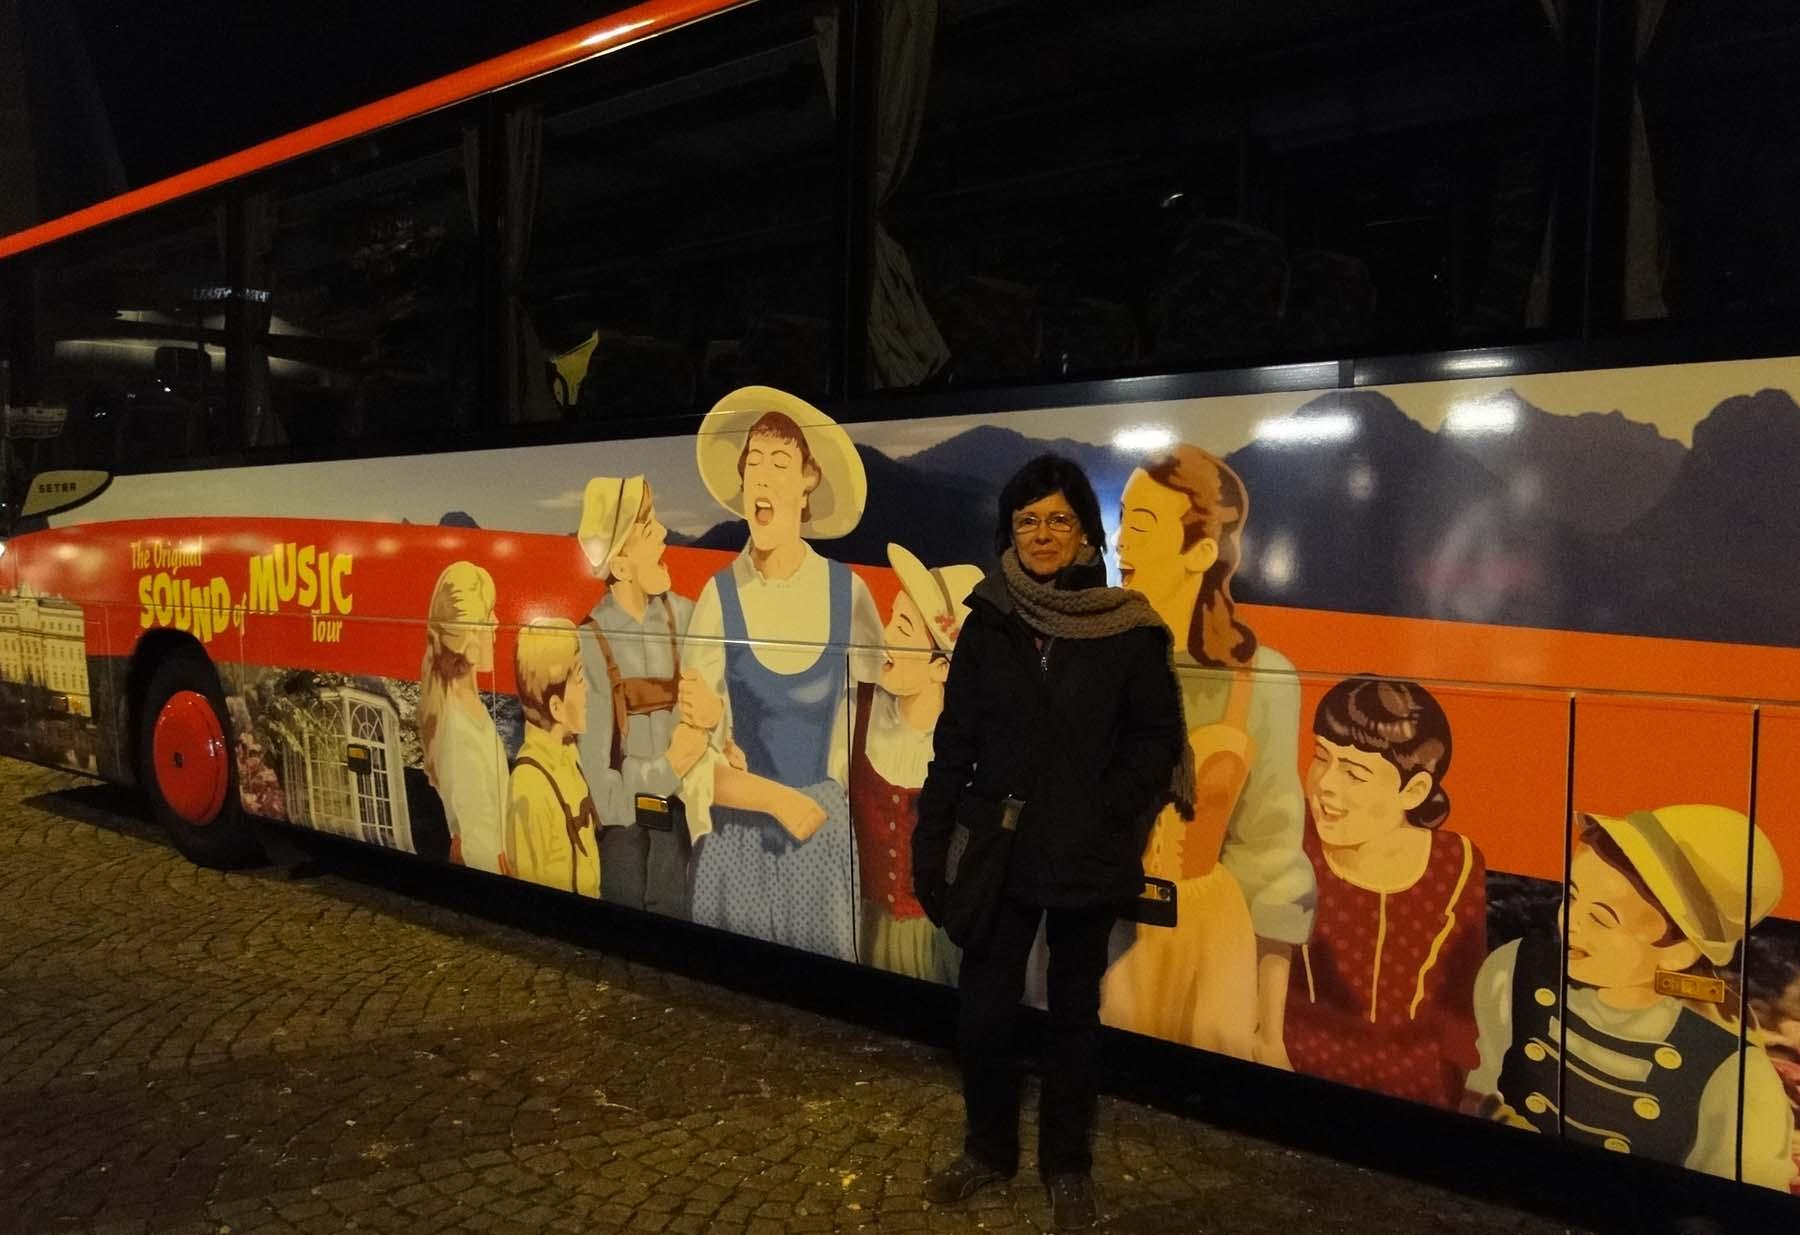 Innsbruck e Salzburg: o que fazer no outono